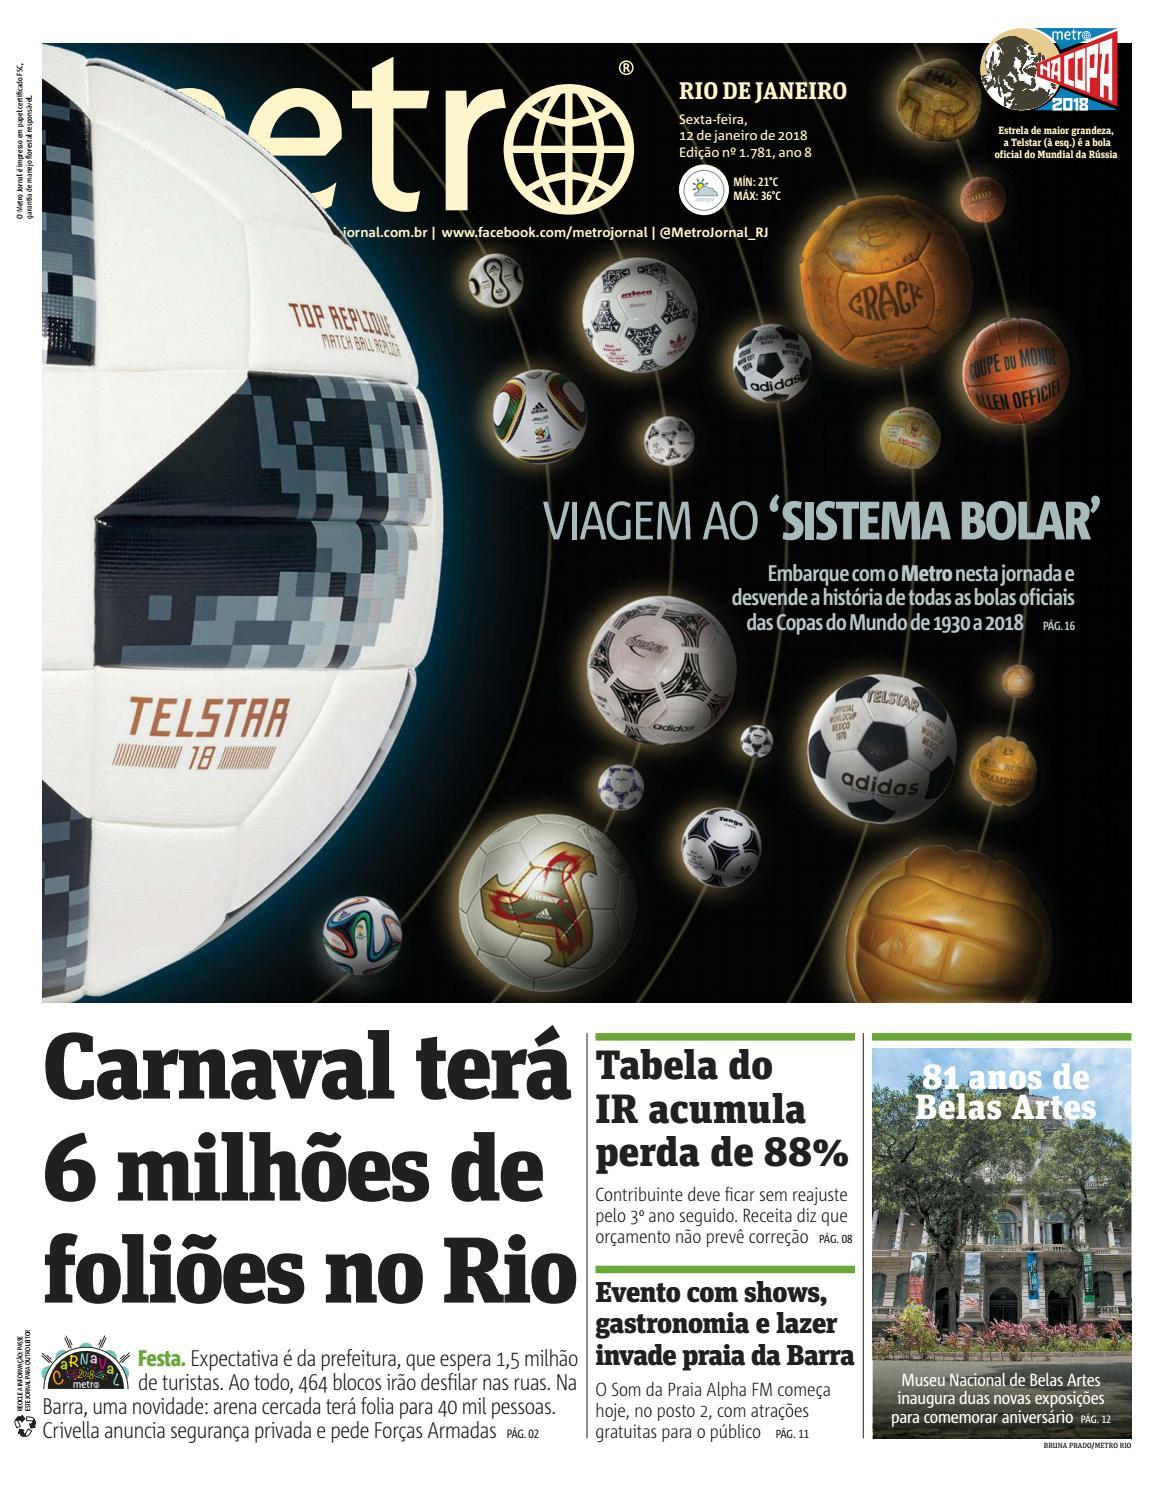 Jornal Metrô Rio de Janeiro Nº 1781 by Portal Academia do Samba - issuu 0507261831cc9